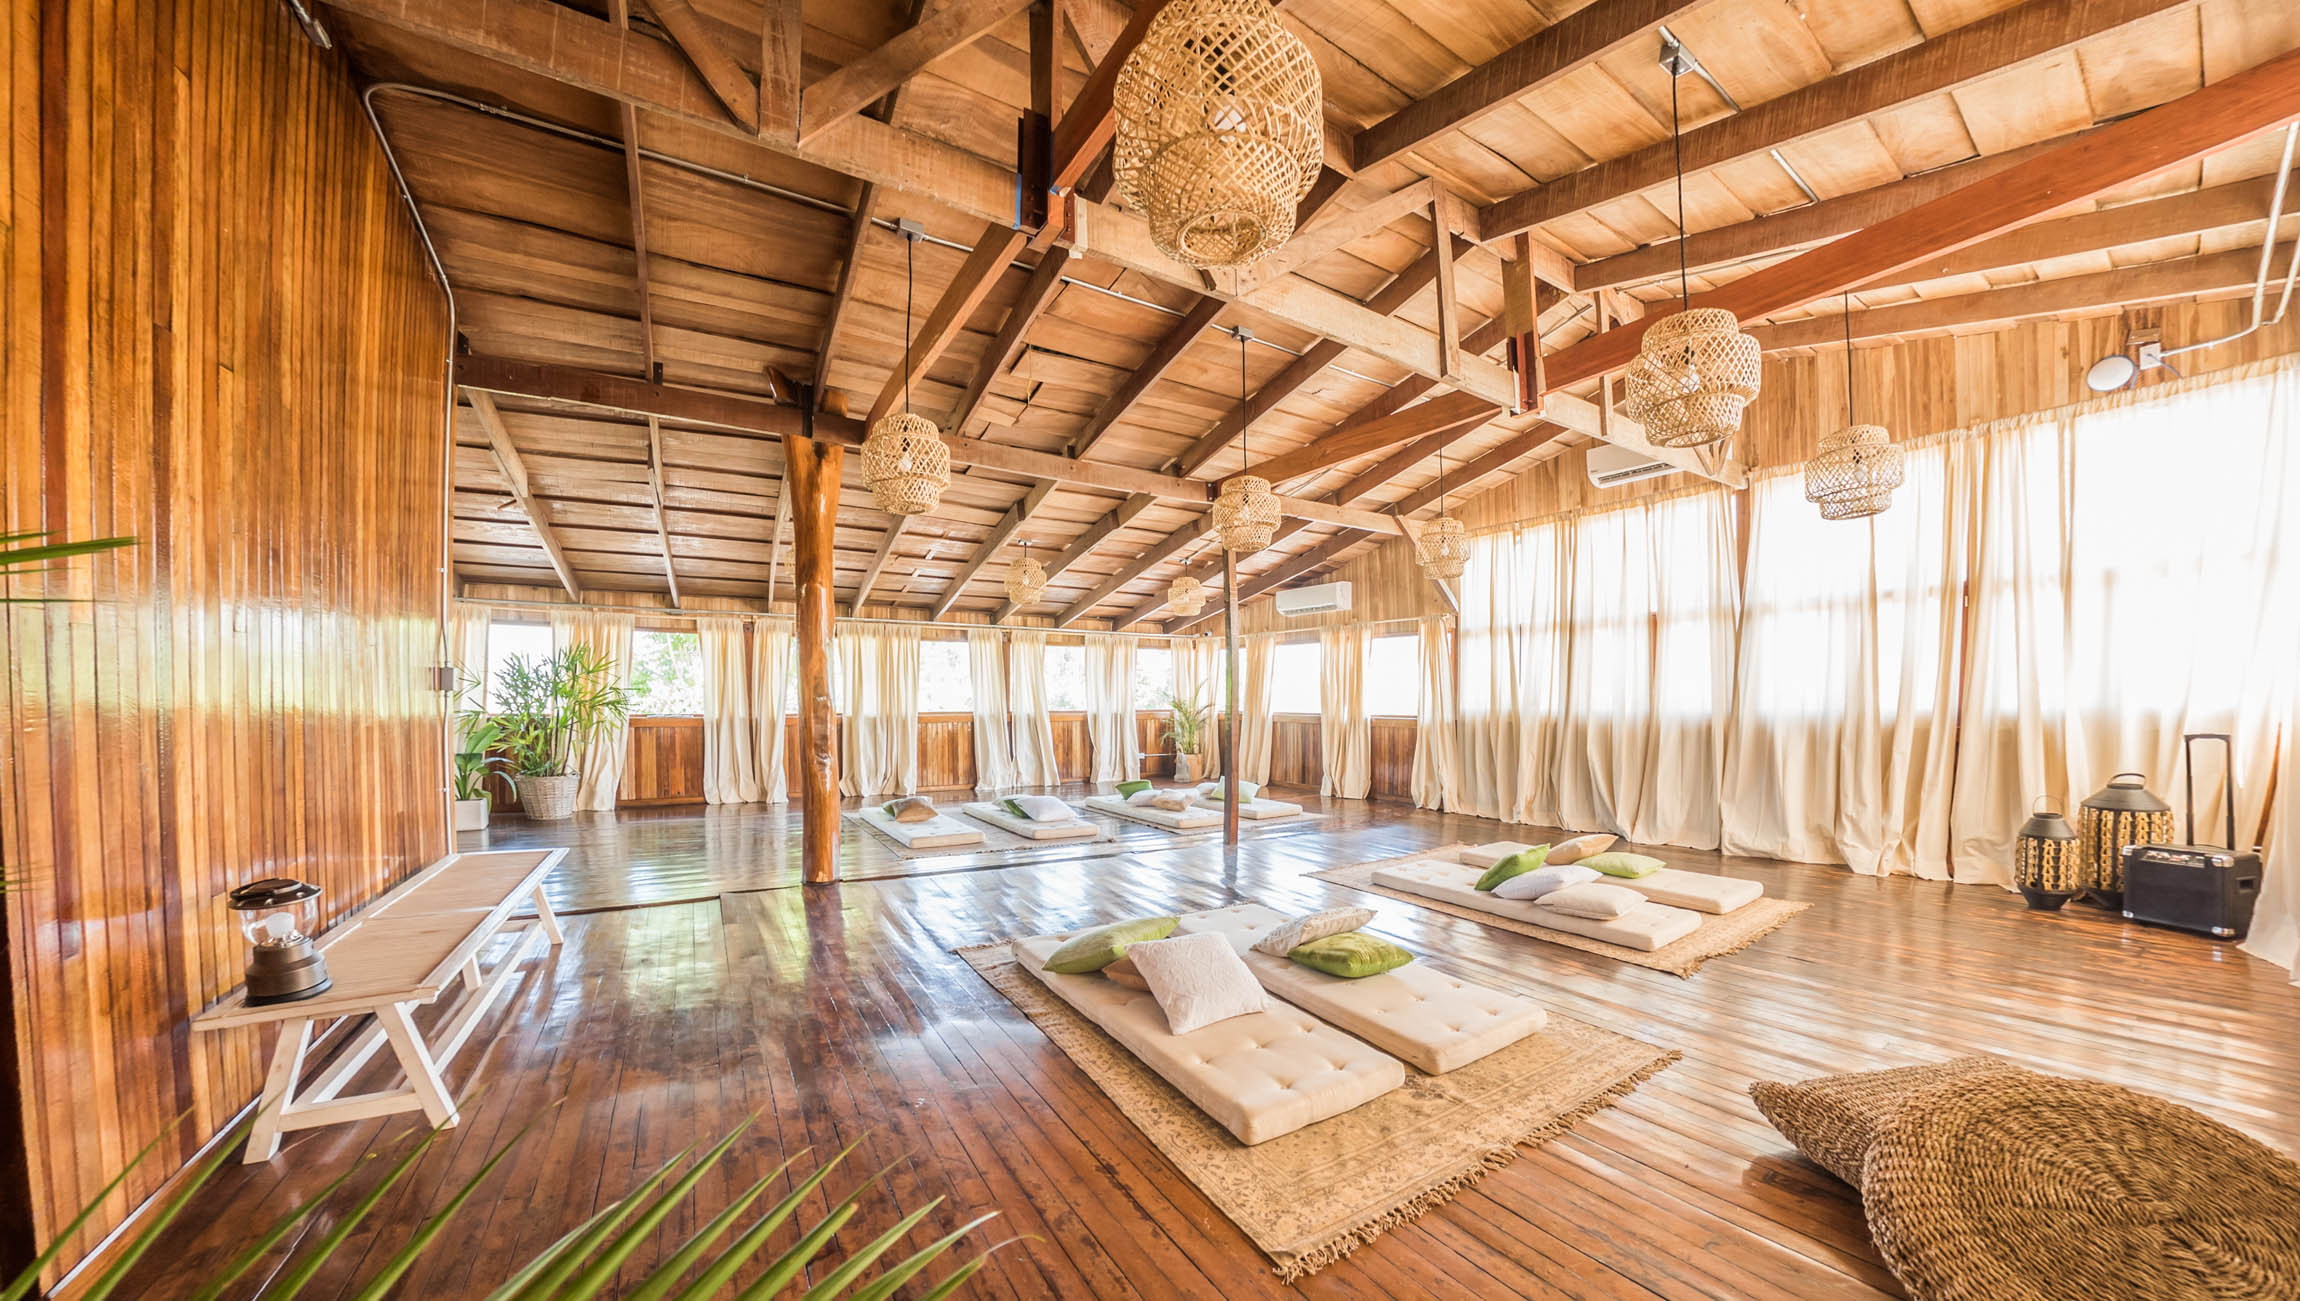 the move-ment meditation room